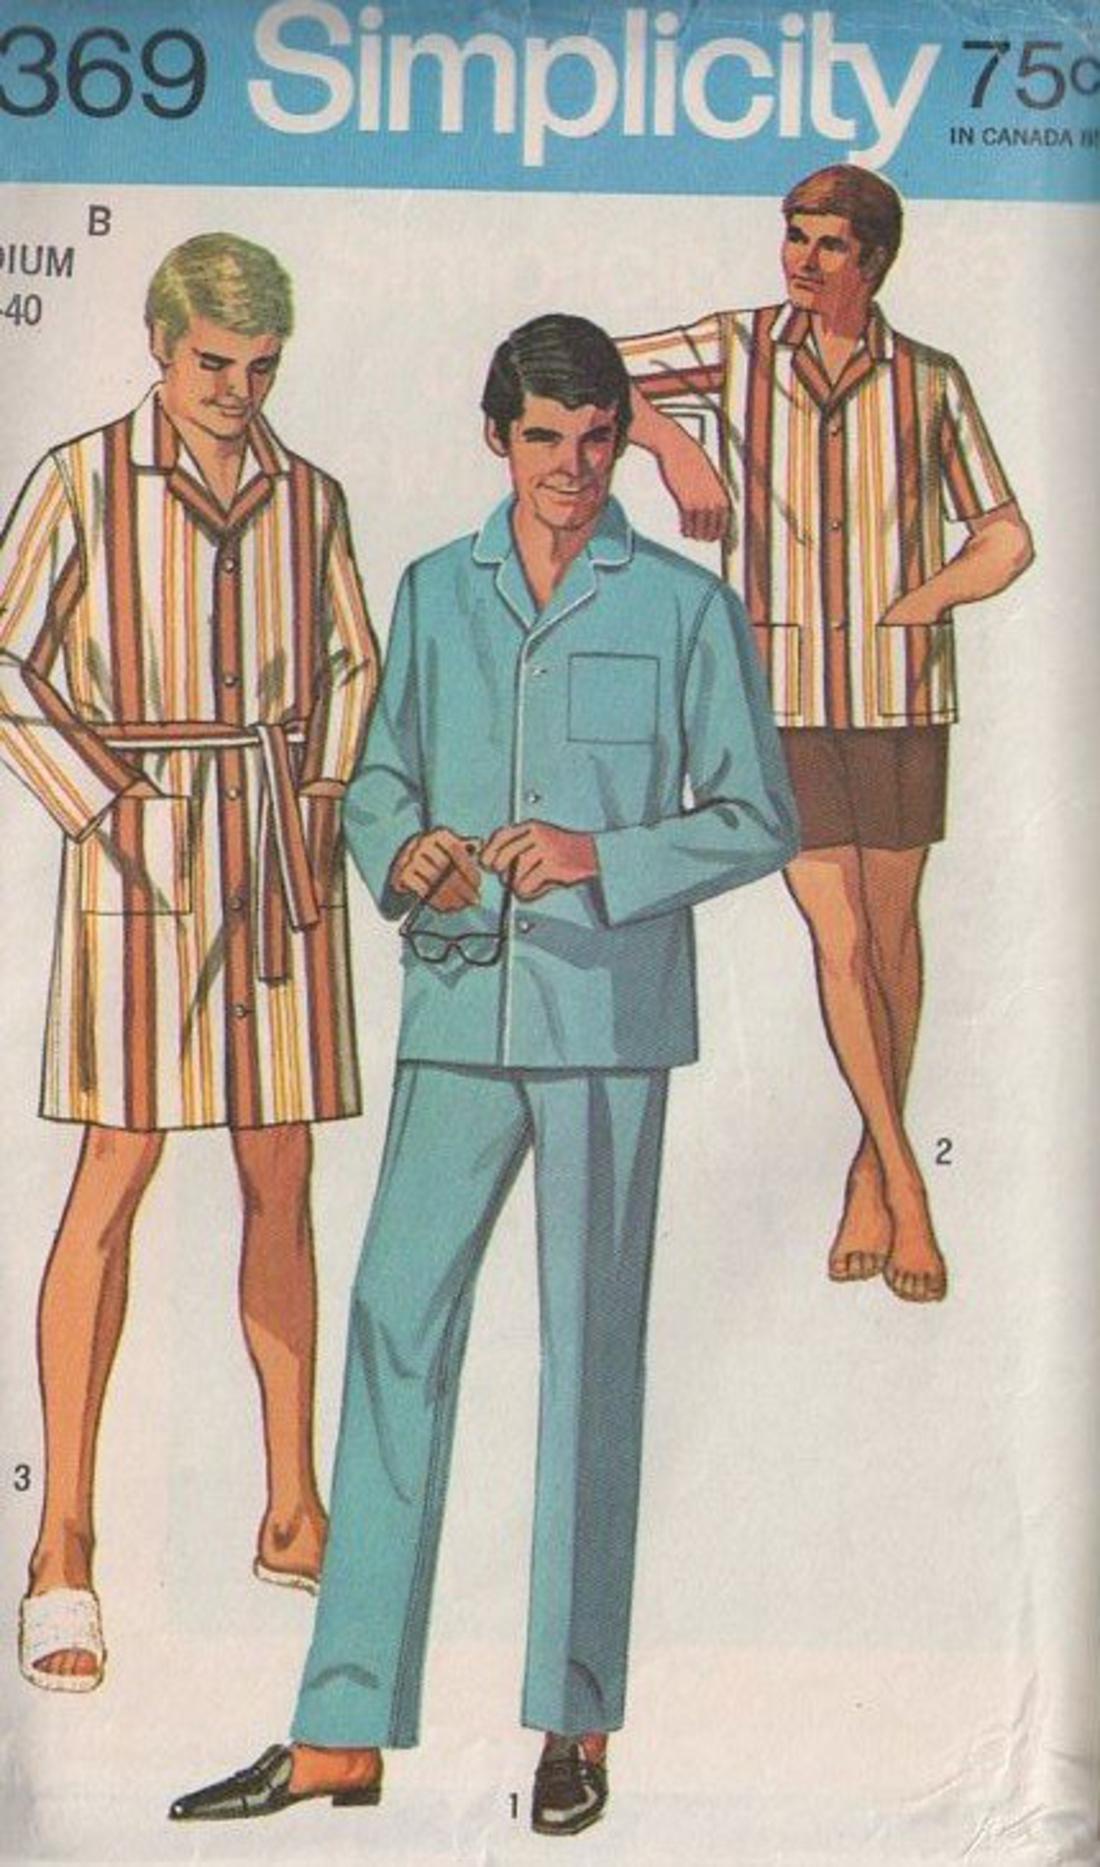 Momspatterns Vintage Sewing Patterns Simplicity 8369 Vintage 60 S Sewing Pattern Fab Men S Don Draper Mad Men Pajamas Top Pants Fly Front Boxers Shorts Sleep Coat Robe Big Tall Size S